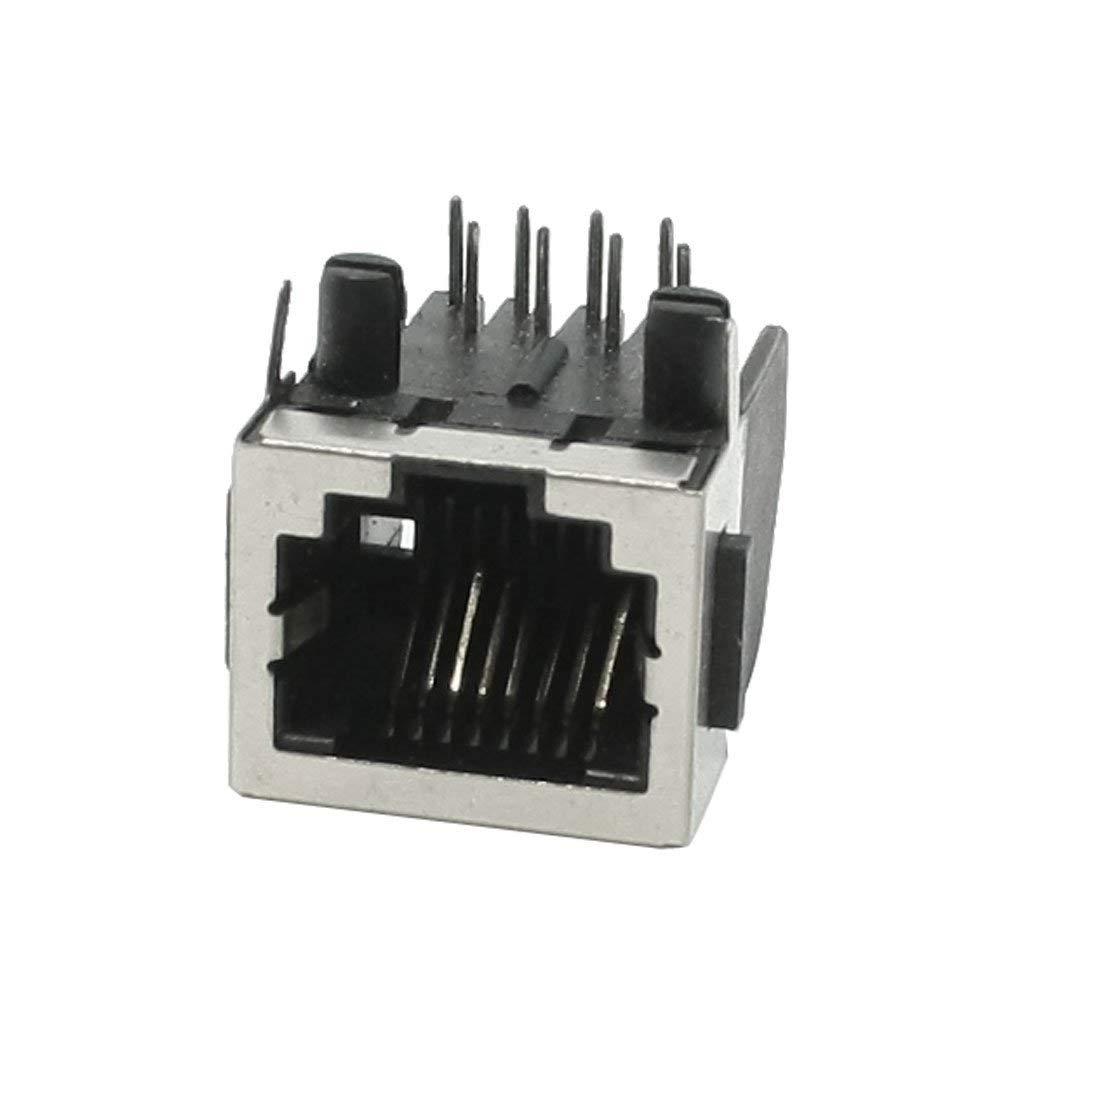 uxcell RJ45 8P8C 8 Position Modular Network PCB Jack Socket Port 18mm Length